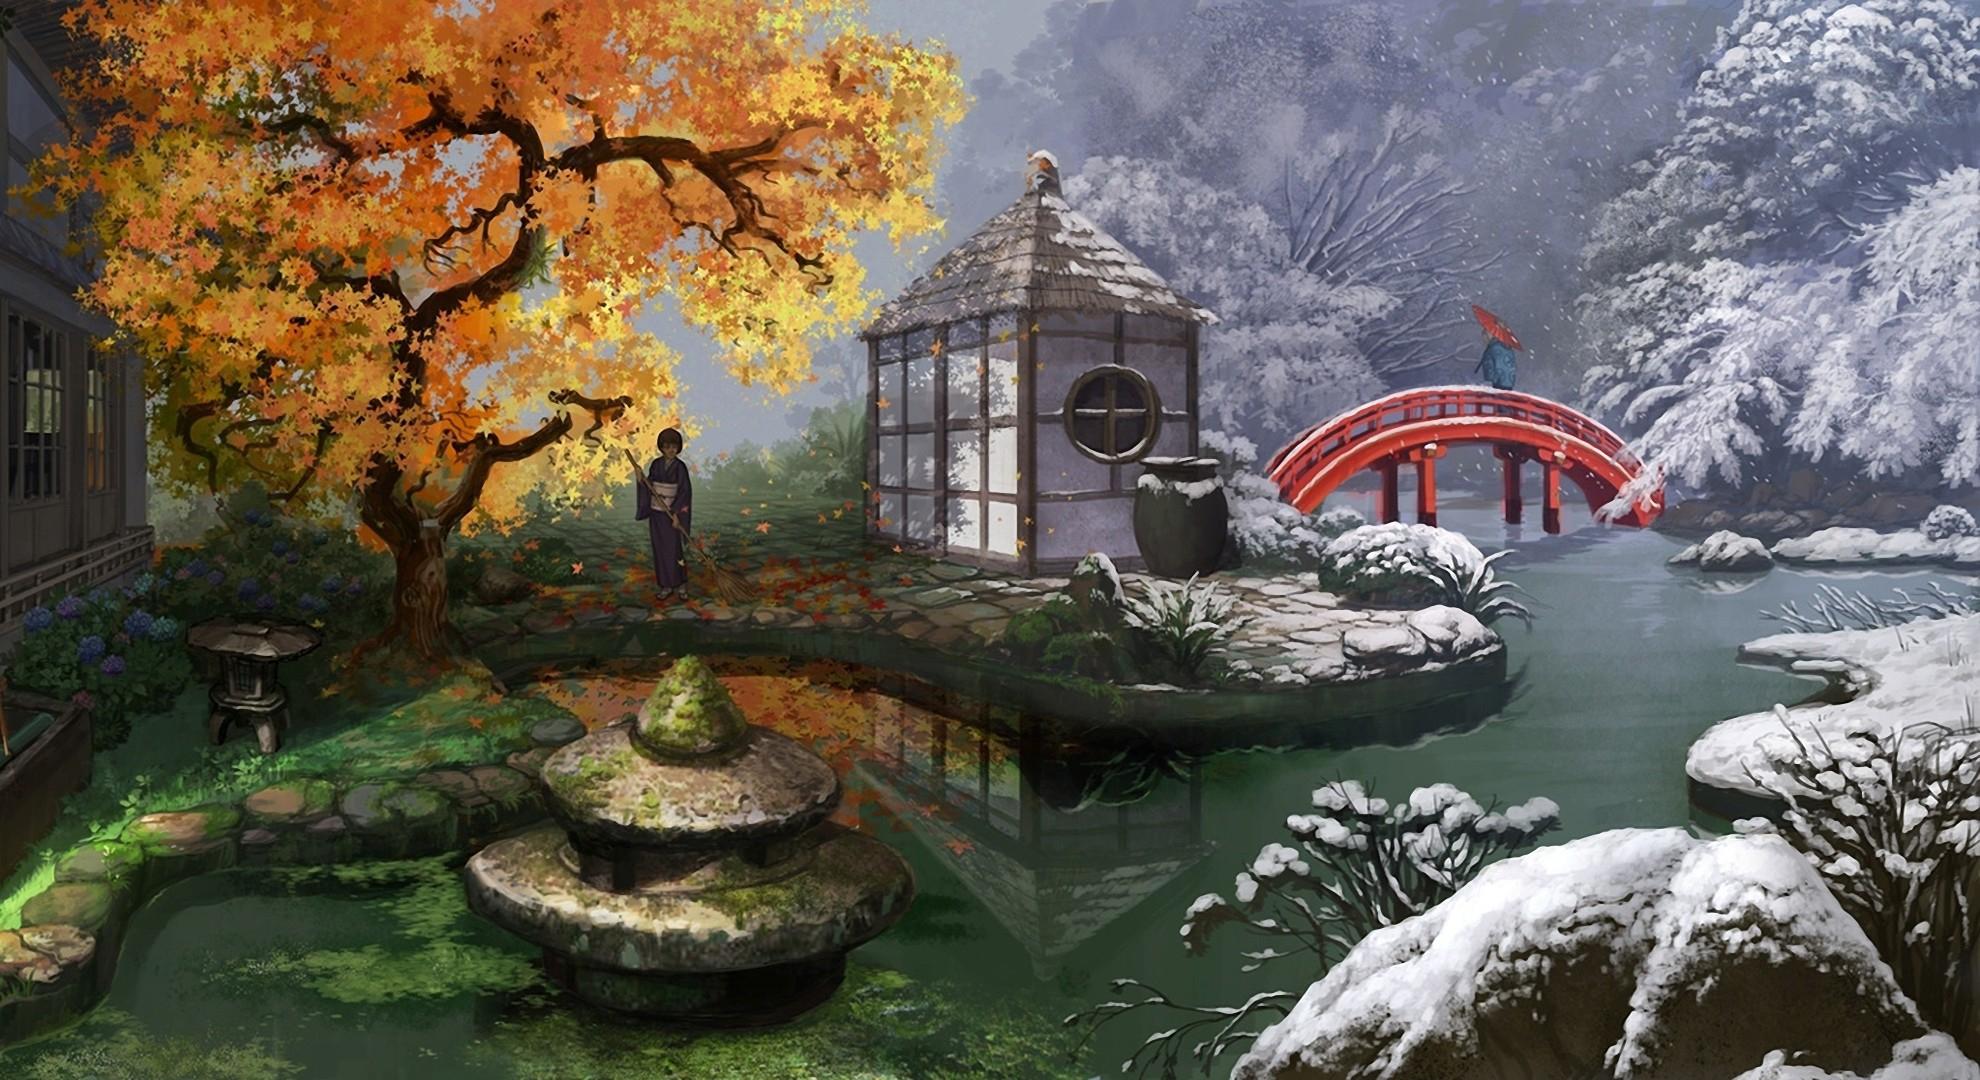 seasons 1980x1080 wallpaper Nature Seasons HD Desktop Wallpaper 1980x1080